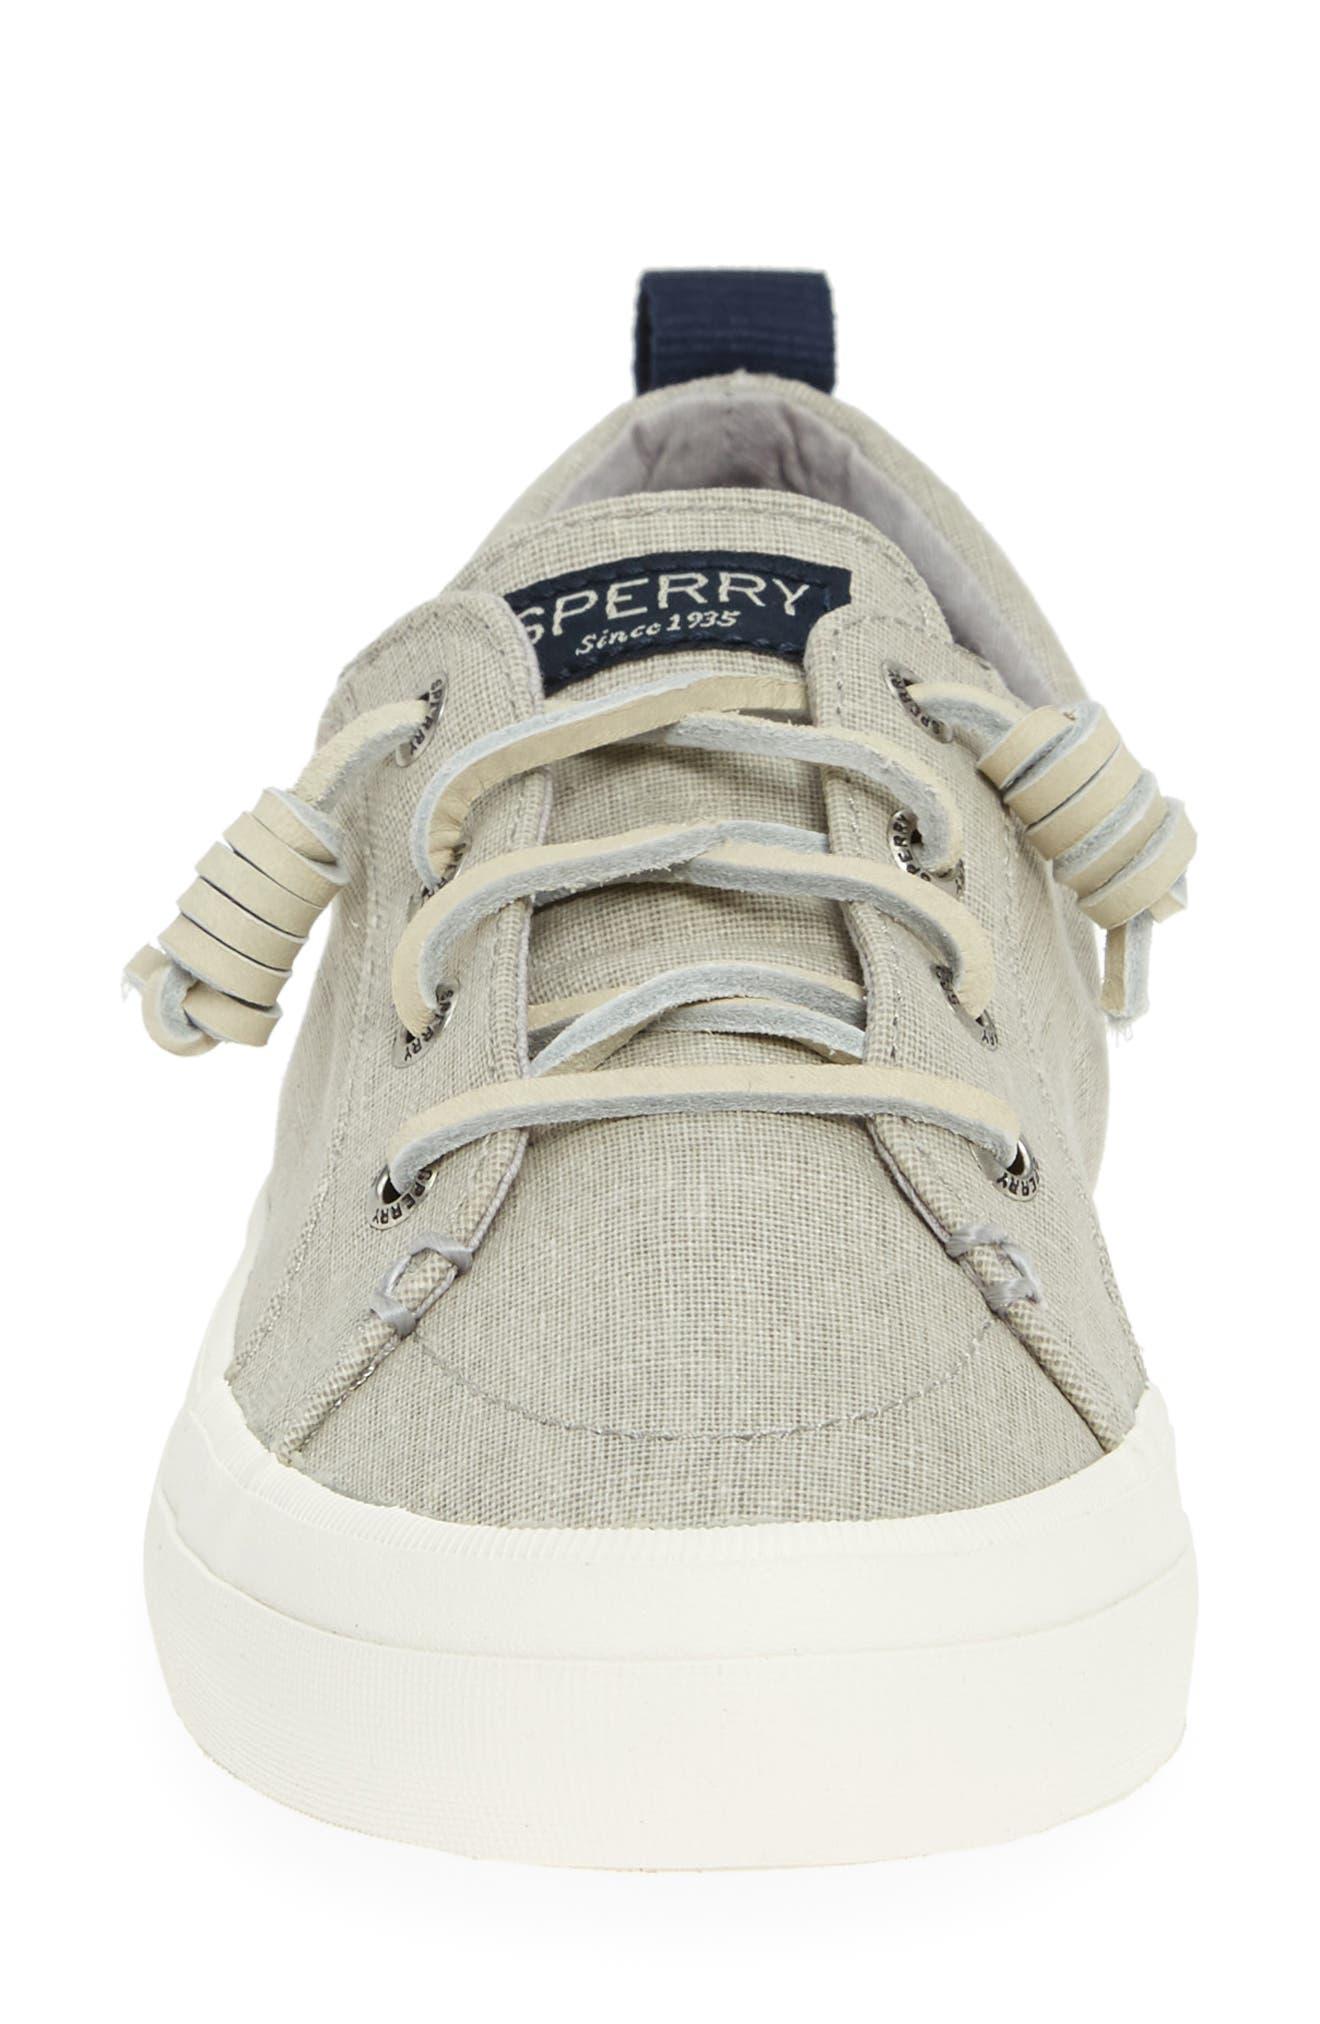 SPERRY, Crest Vibe Sneaker, Alternate thumbnail 4, color, GREY LINEN FABRIC